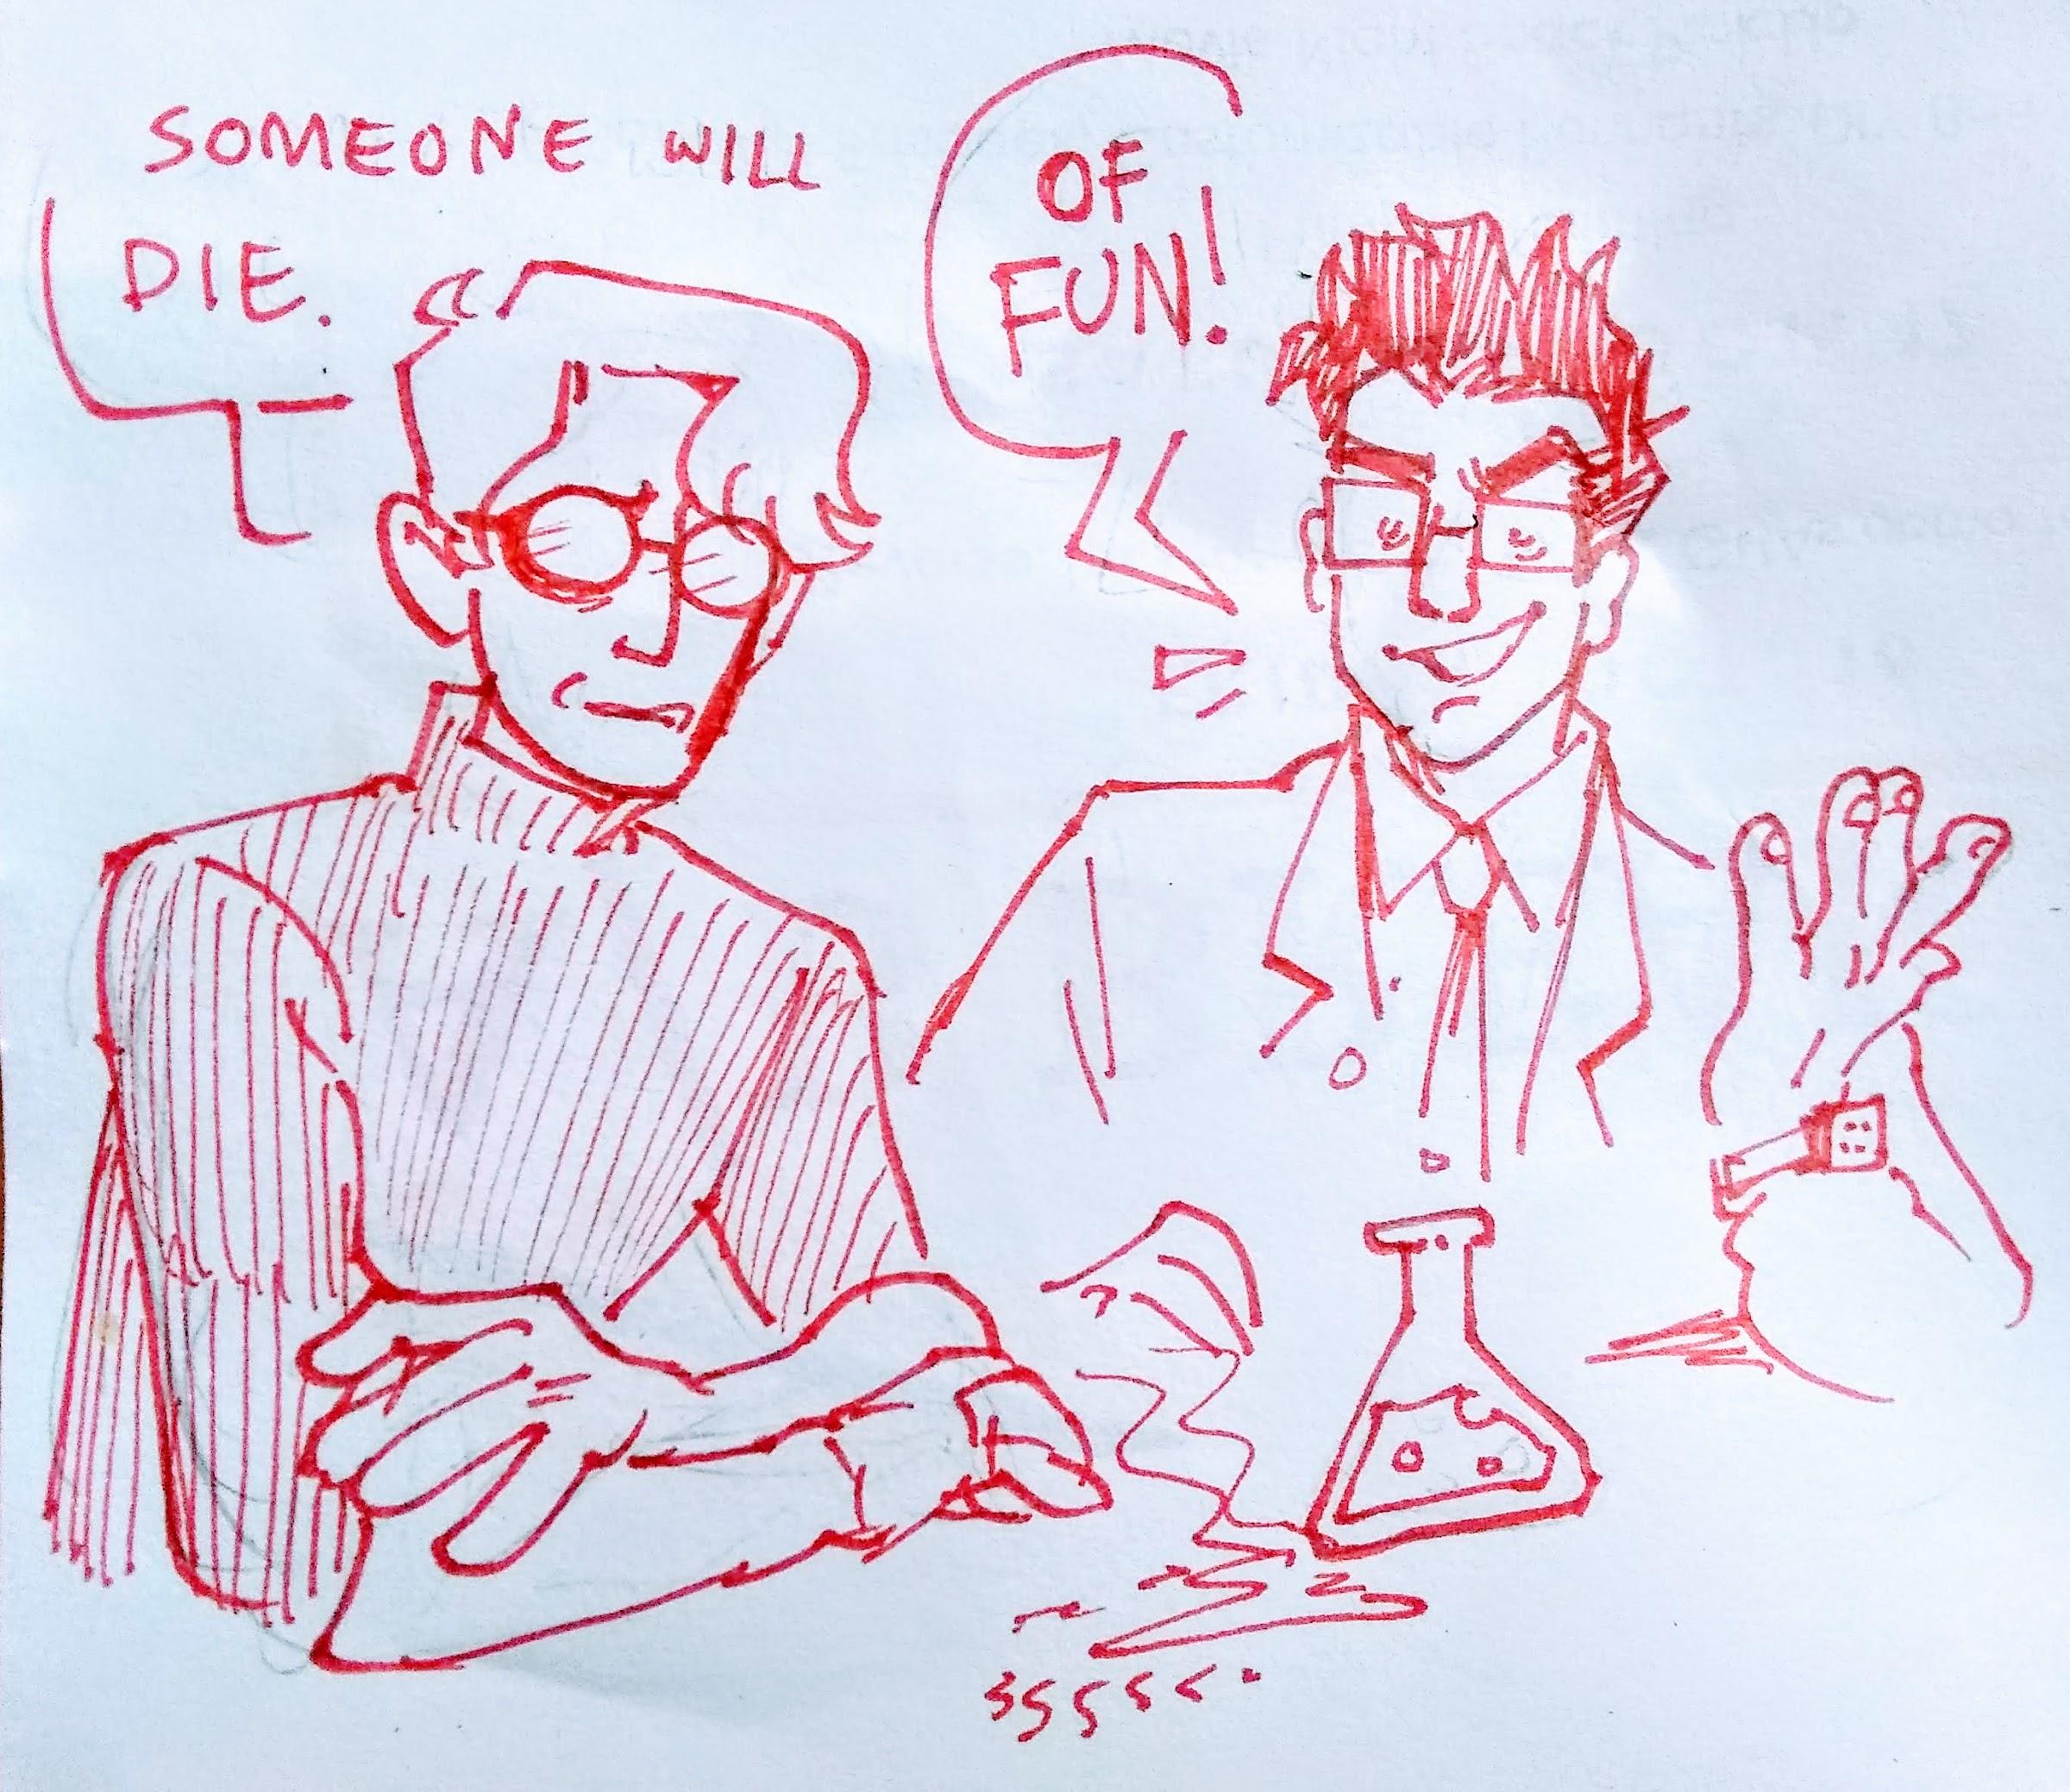 John X says: Someone will die. John Y adds: Of fun!